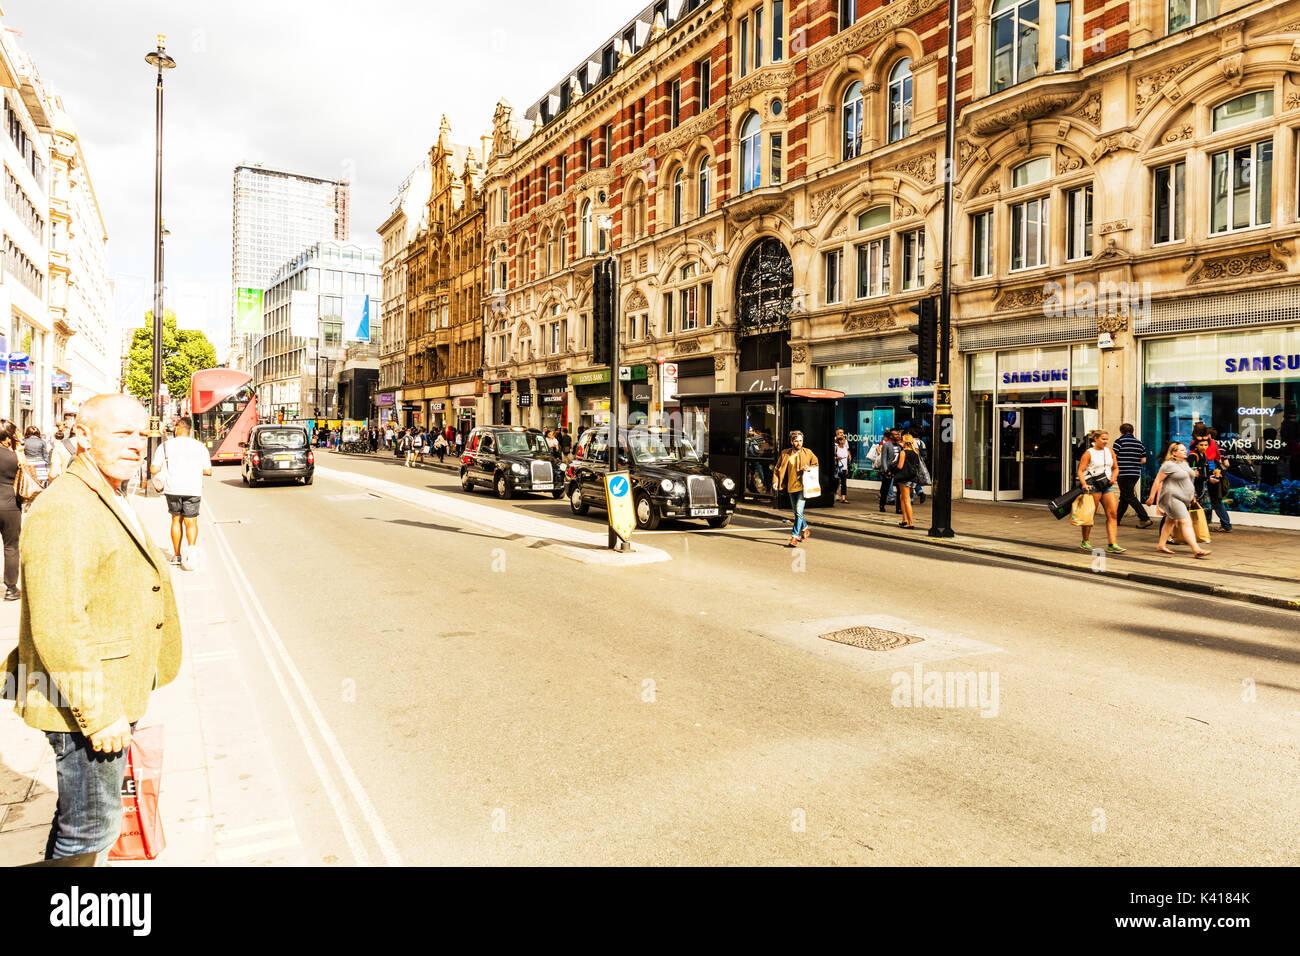 Oxford street London UK, Oxford street, Oxford st London, London main shopping street, Oxford street shopping London, Oxford st shops, London shopping - Stock Image